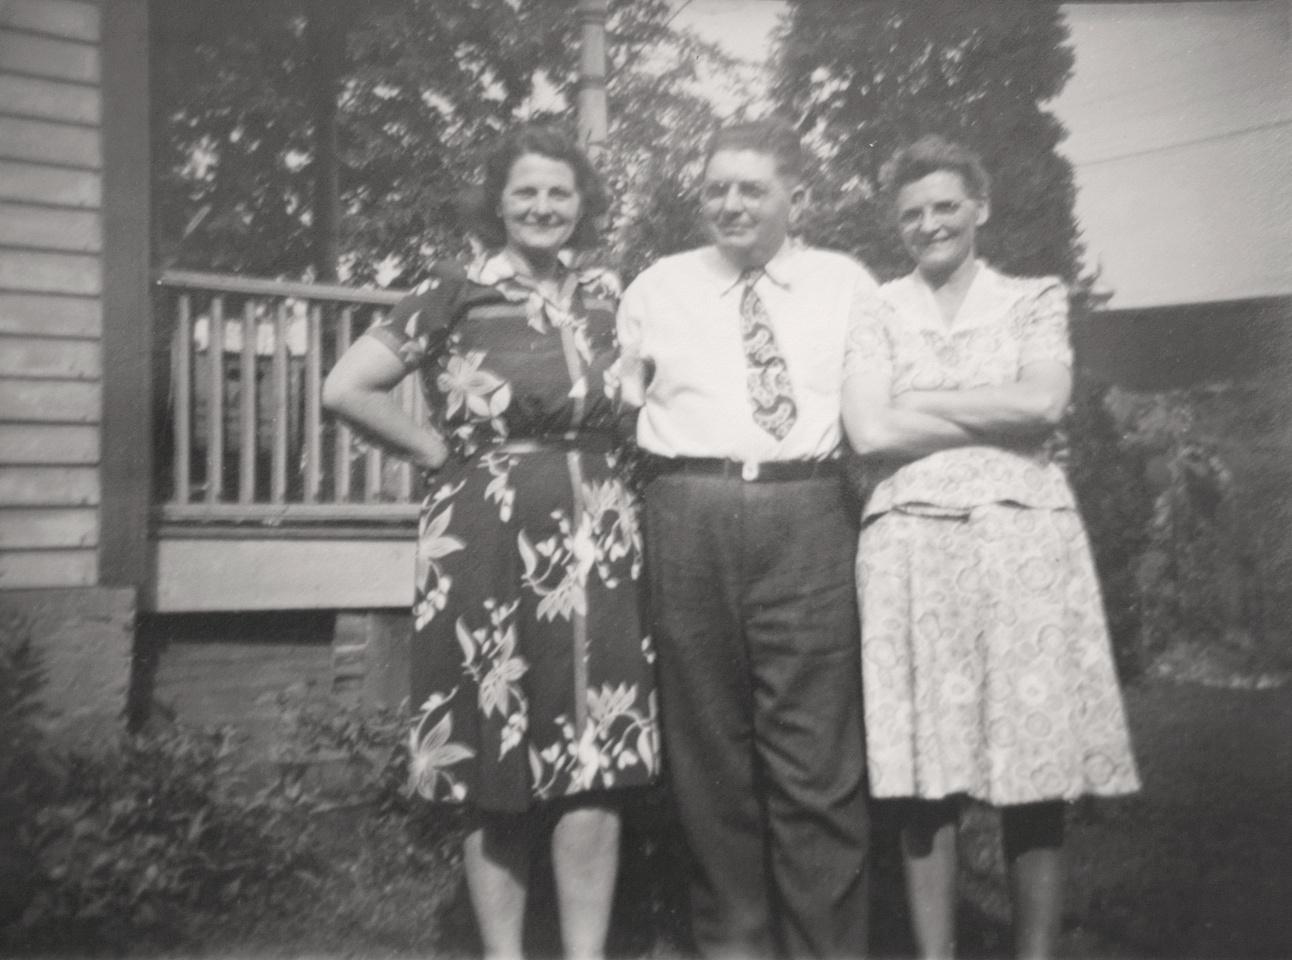 Michelle M. Murosky: The Murosky Collection &emdash; 1940's Murosky Family Gathering